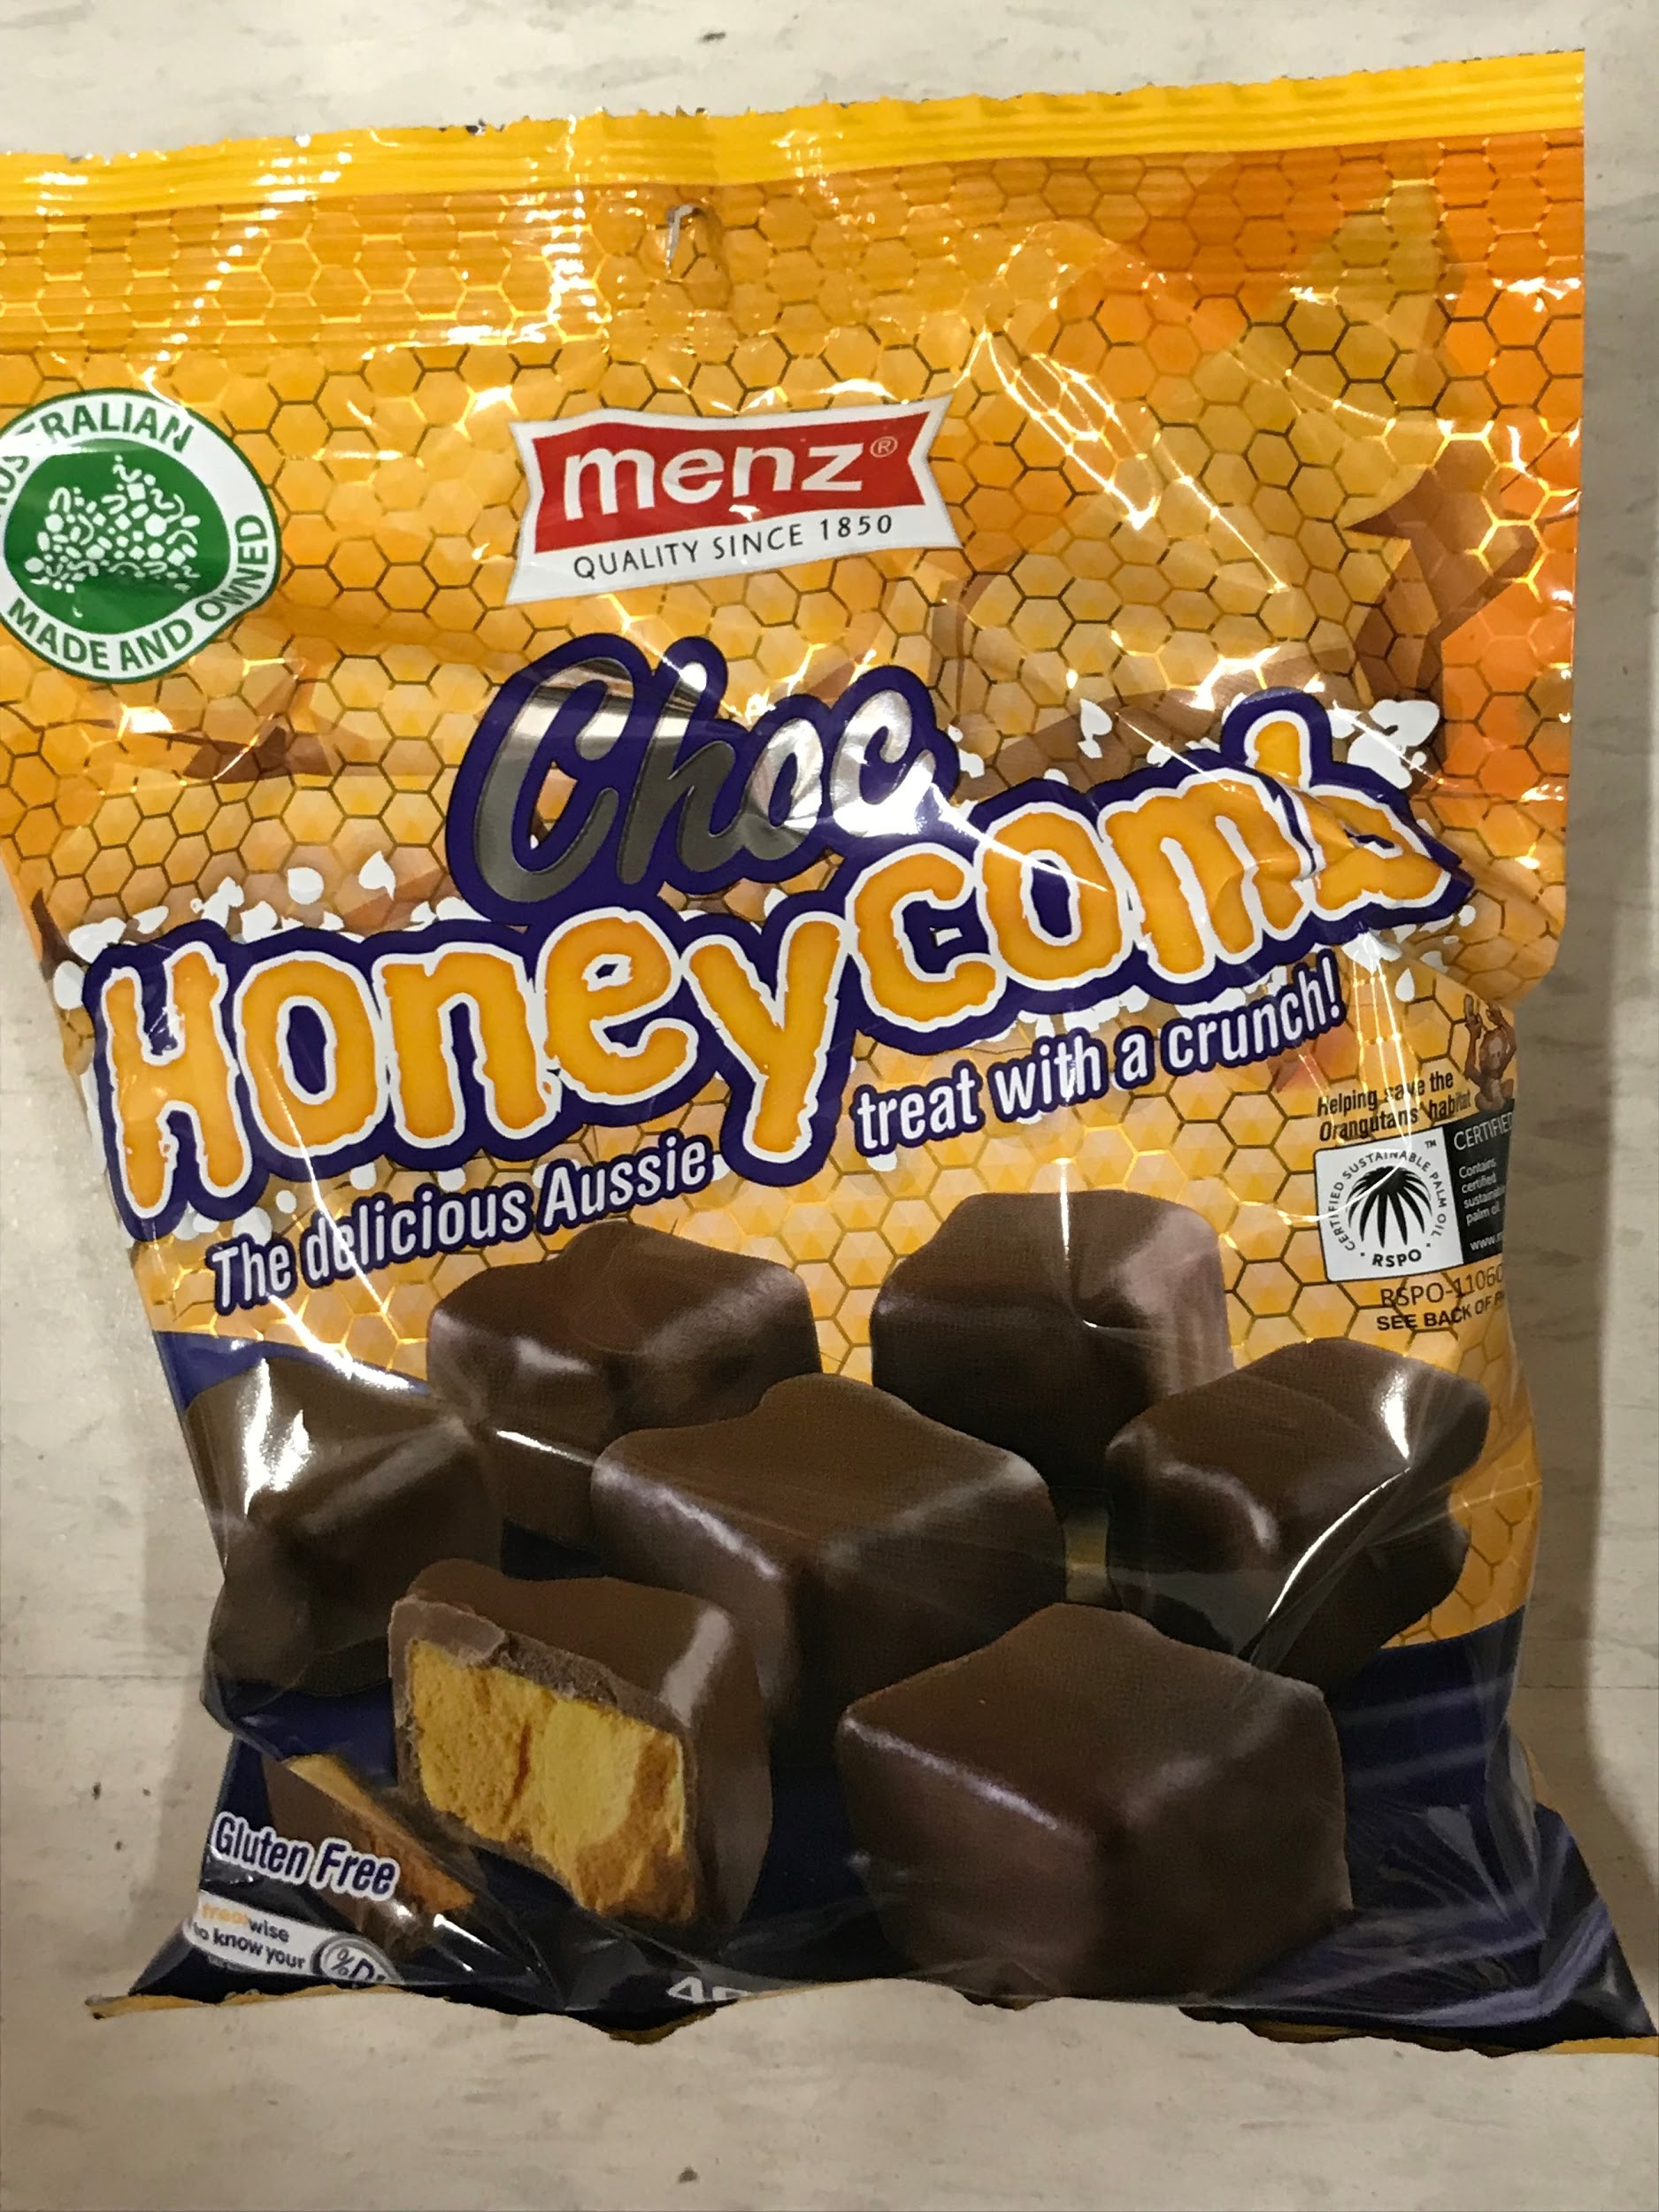 CAPABlogger_Fall2018_Sydney_Martyn Megaloudis_Choc Honeycombs